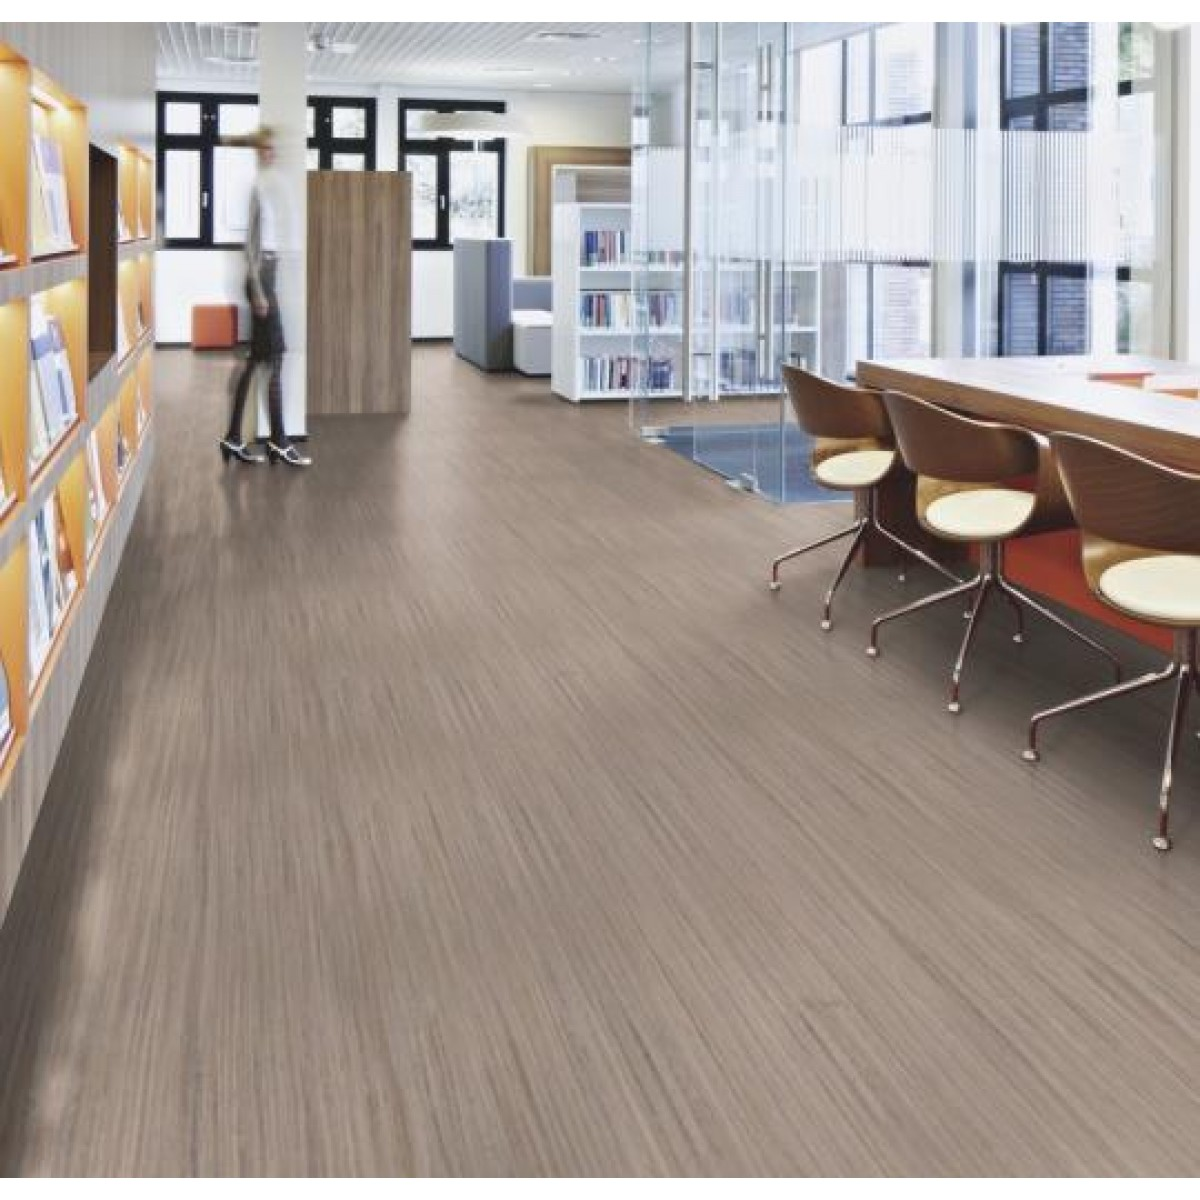 Forbo Marmoleum Striato Natural Sheet Flooring Eco